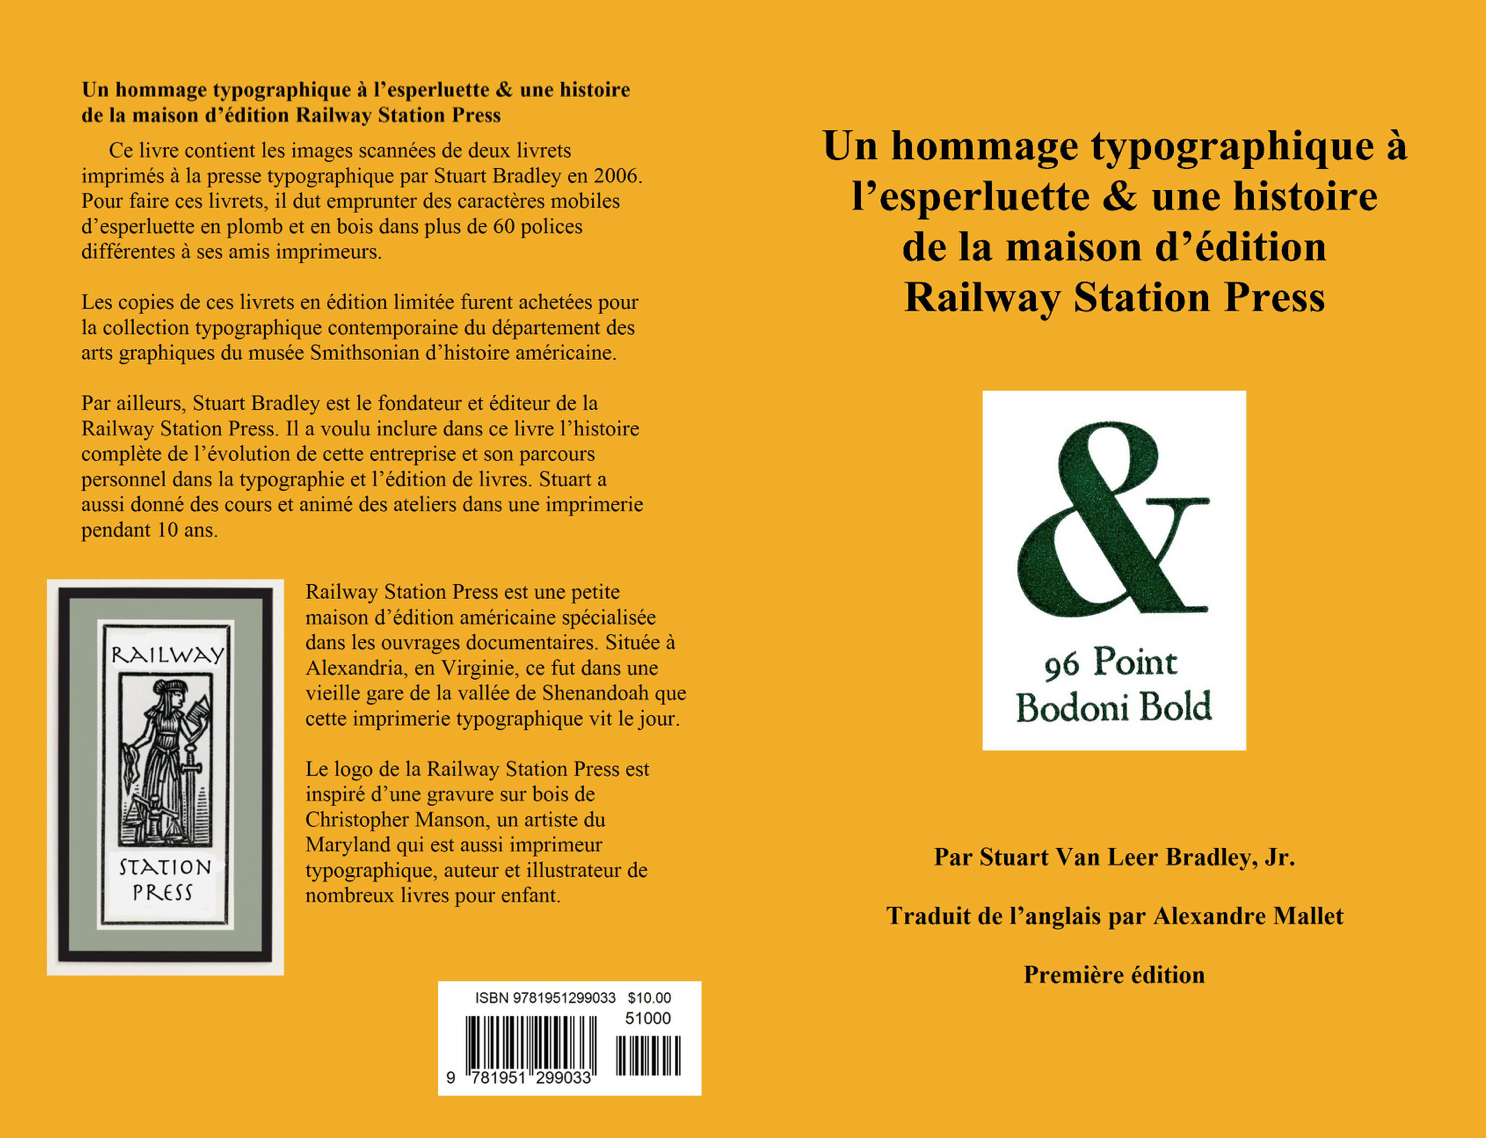 Ampersand en Francais